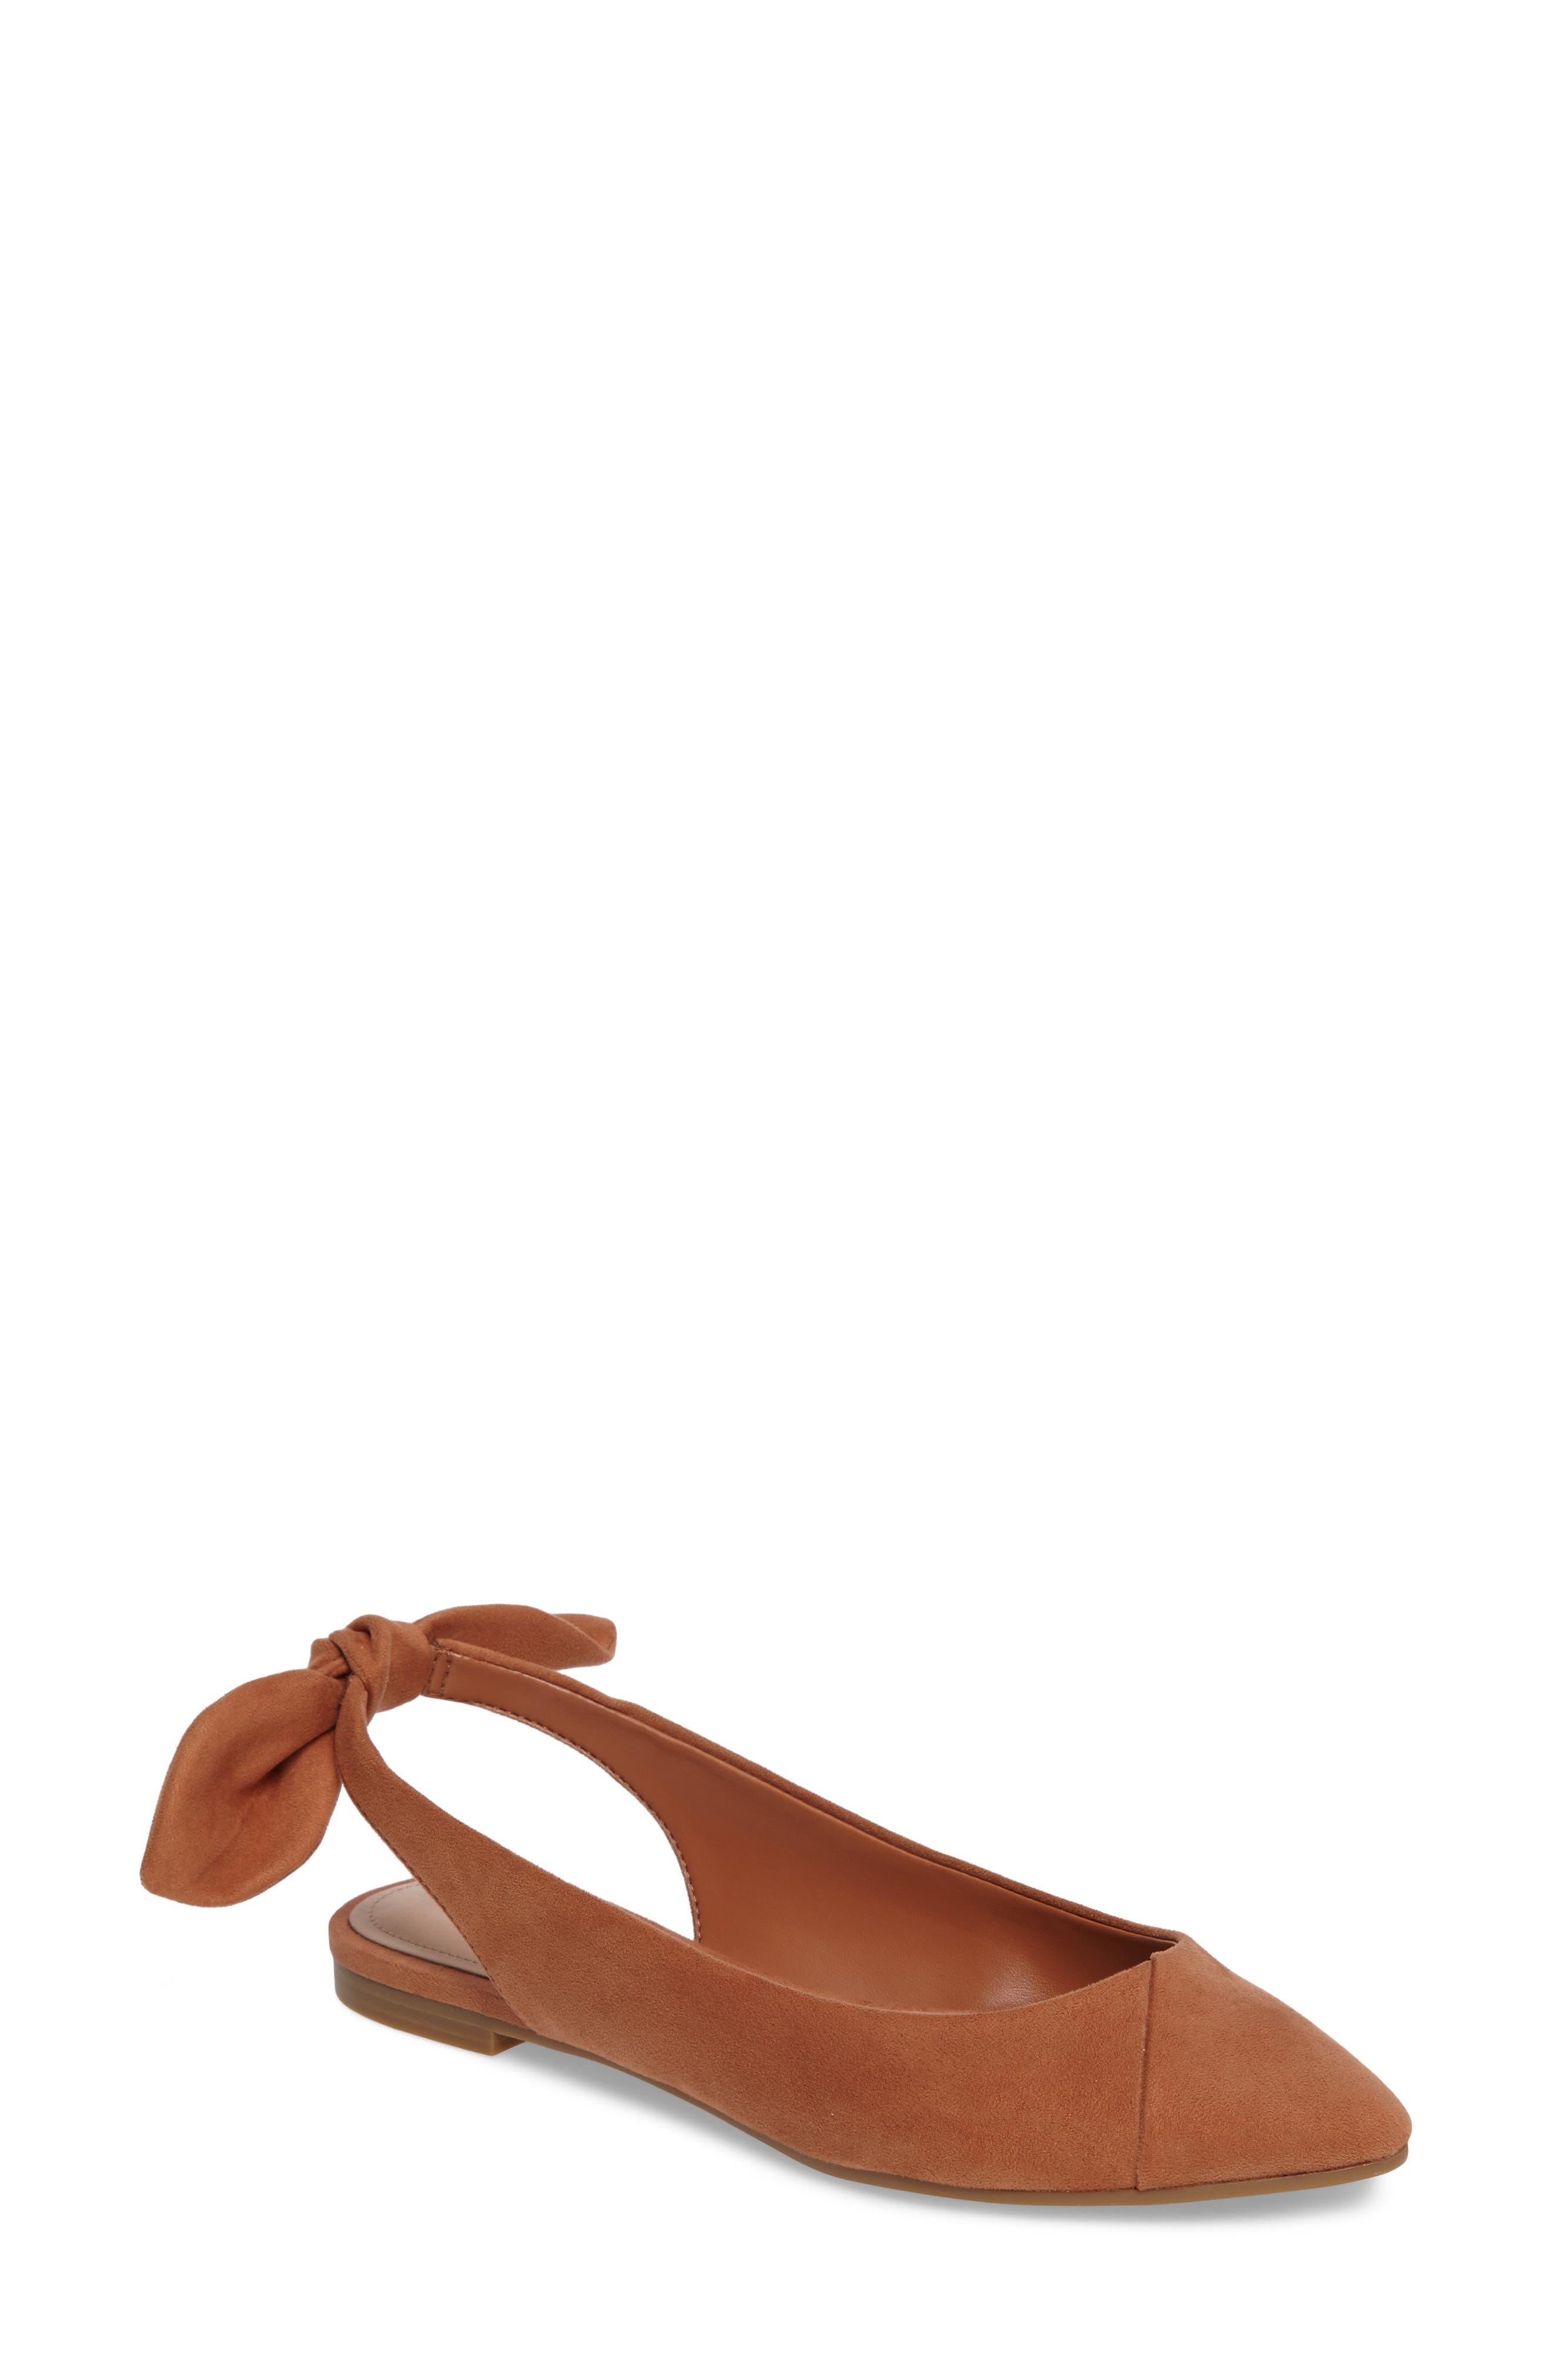 Alternate Image 1 Selected - BCBG Mara Bow Pointy Toe Flat (Women)